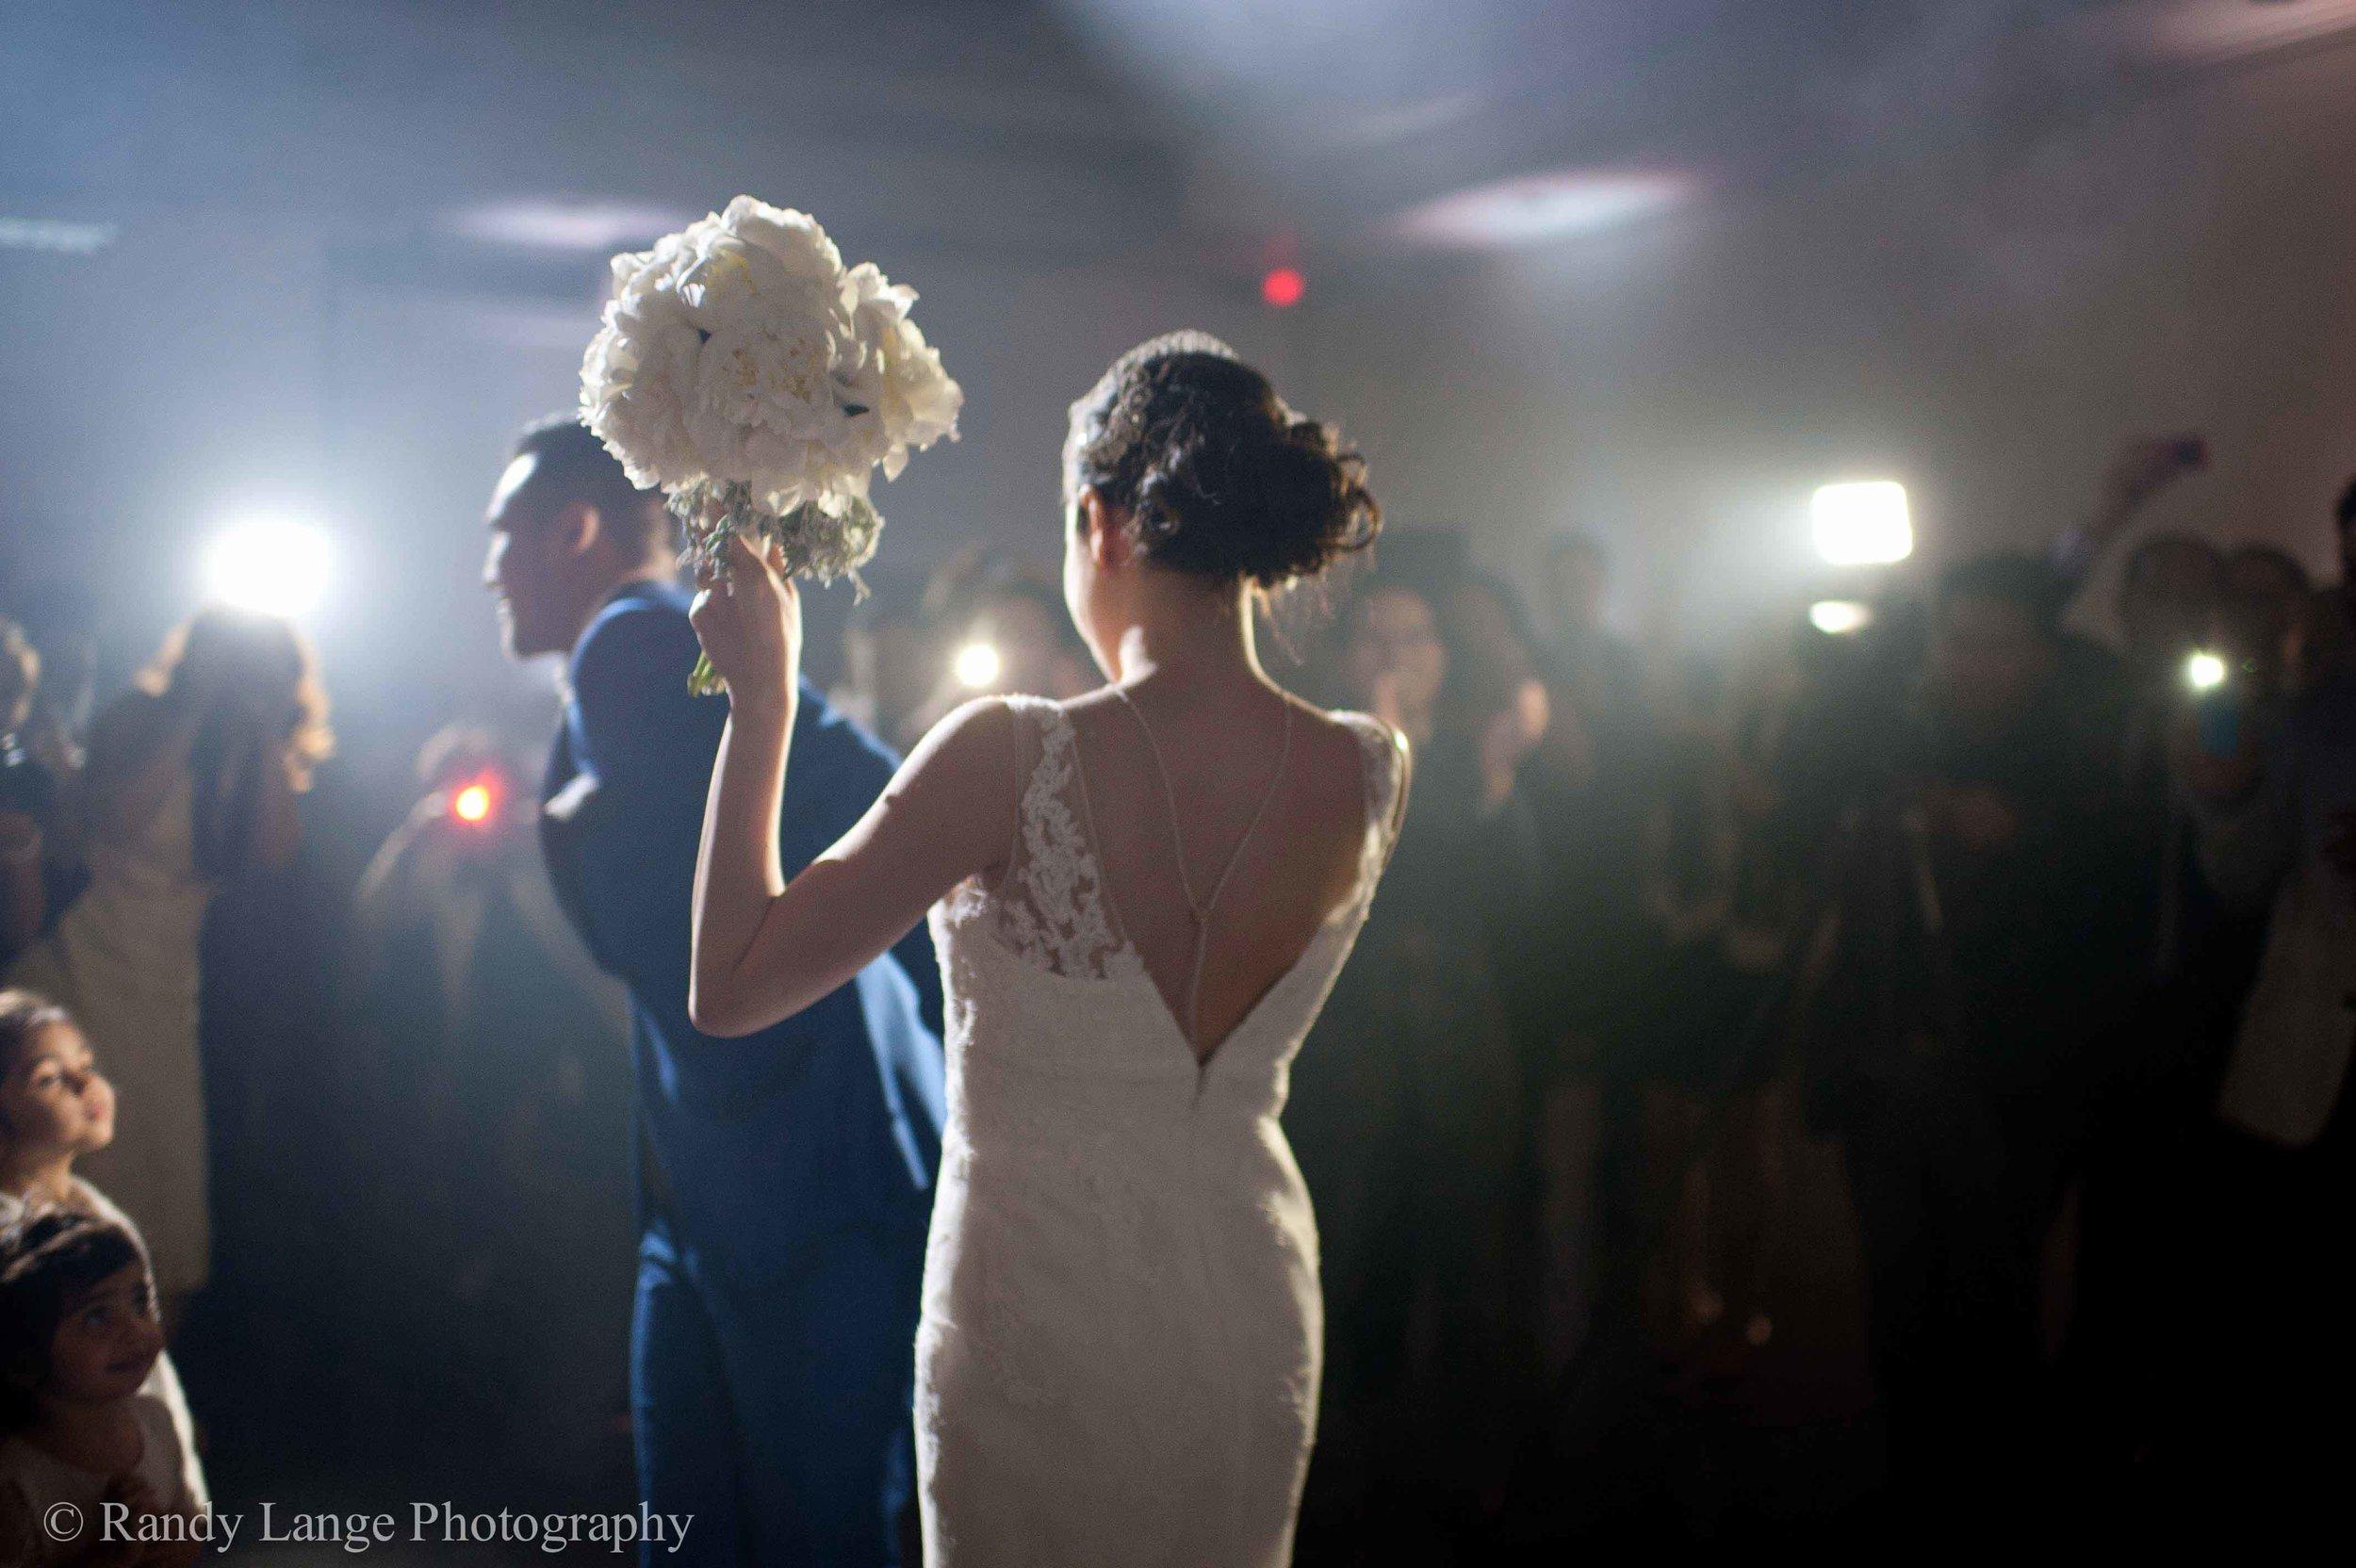 RandyLangePhotography_Ash_Perr_Wedding_54.jpg